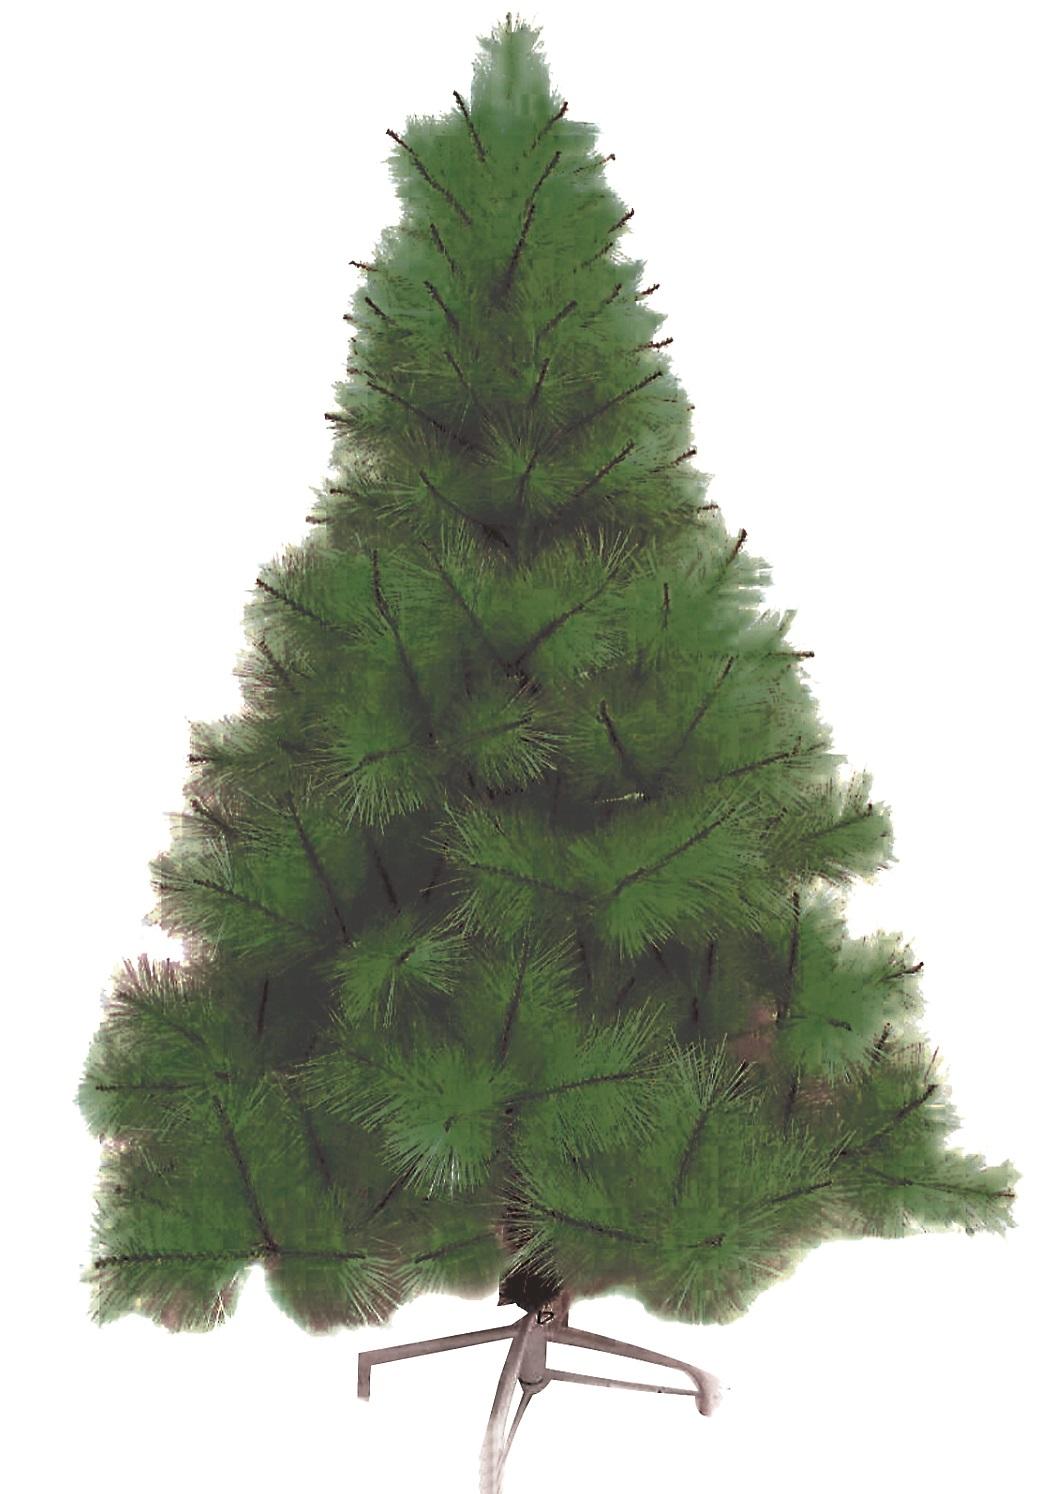 X射線【X020272】2尺聖誕松針樹(綠)(不含飾品、燈飾),聖誕樹/聖誕佈置/聖誕空樹/聖誕造景